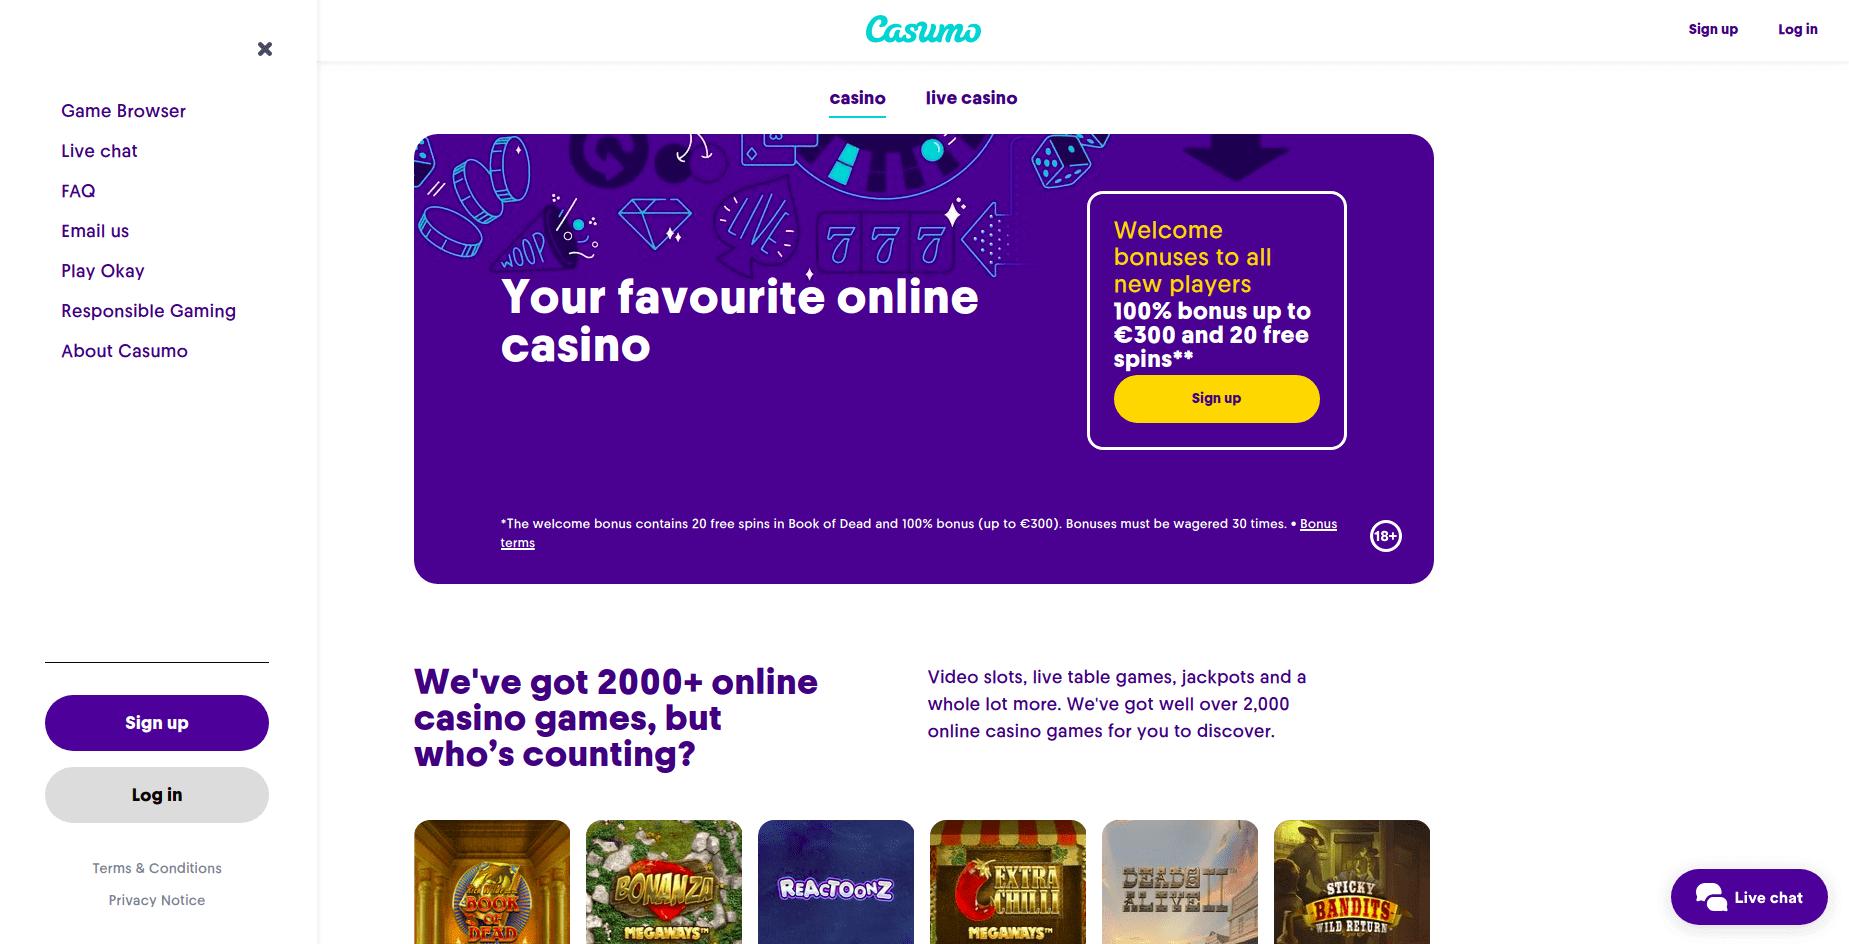 casumo-home-page